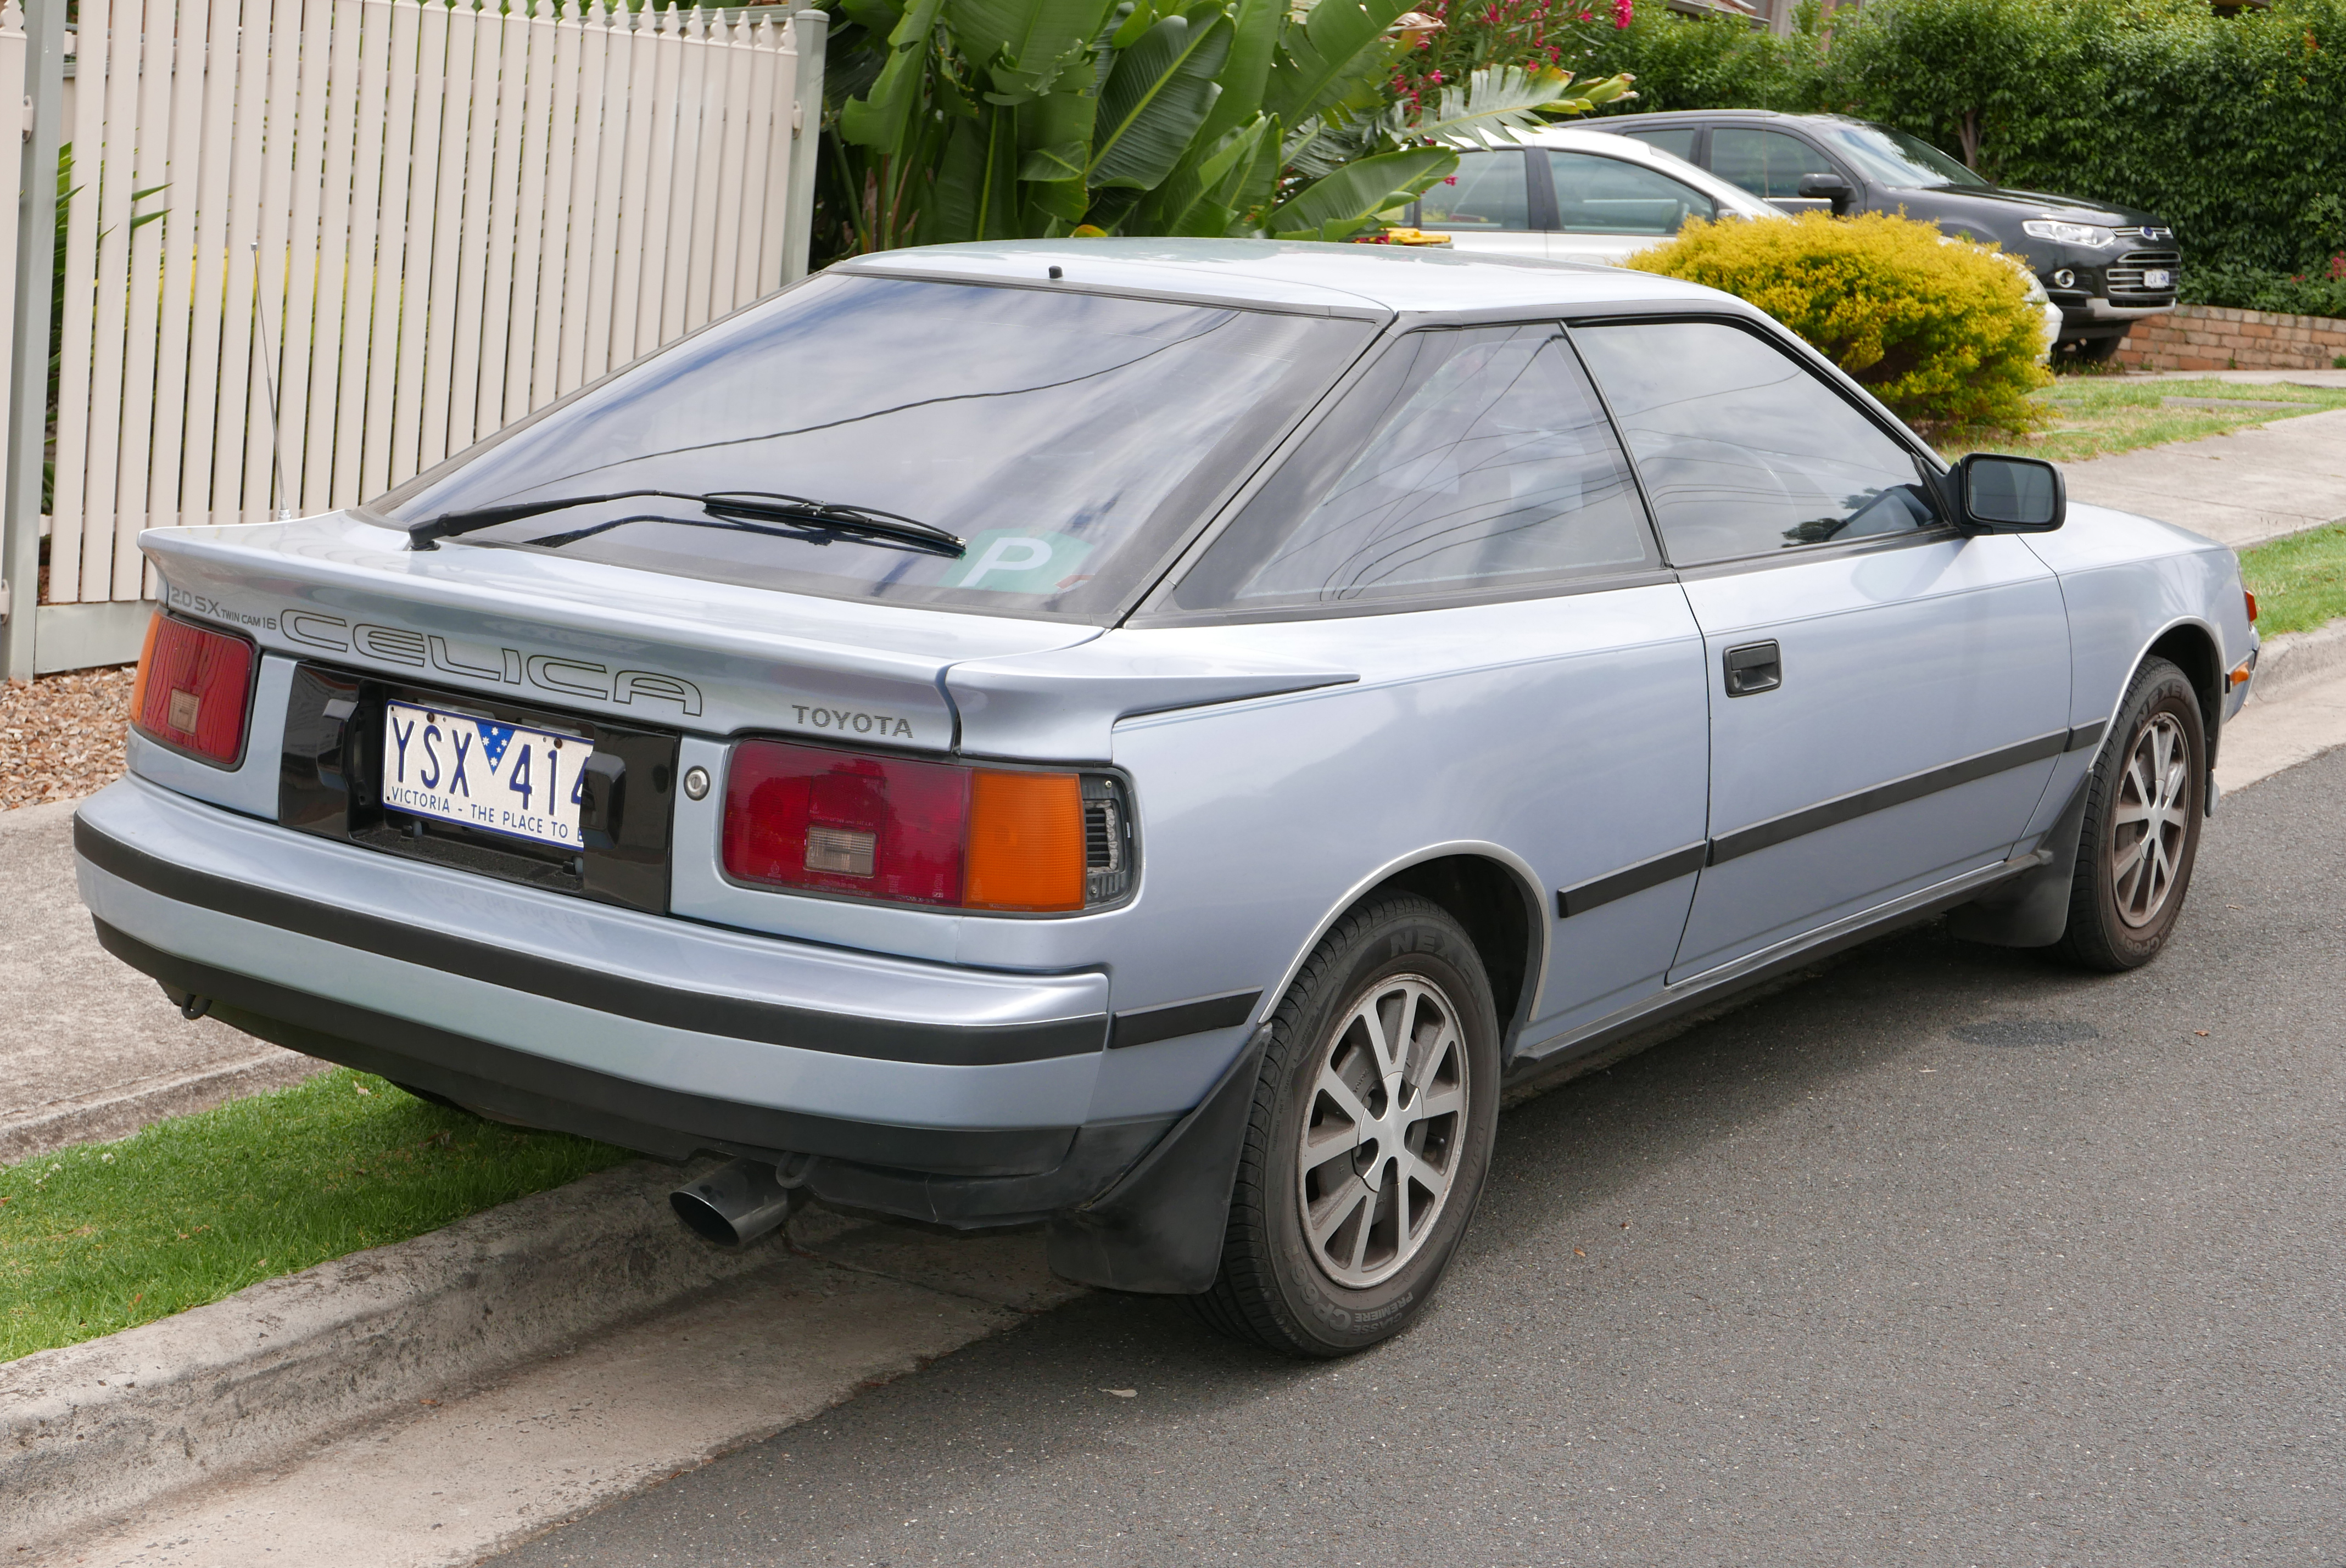 Toyota Celica 2016 >> File:1986 Toyota Celica (ST162) SX liftback (2016-01-04) 02.jpg - Wikimedia Commons